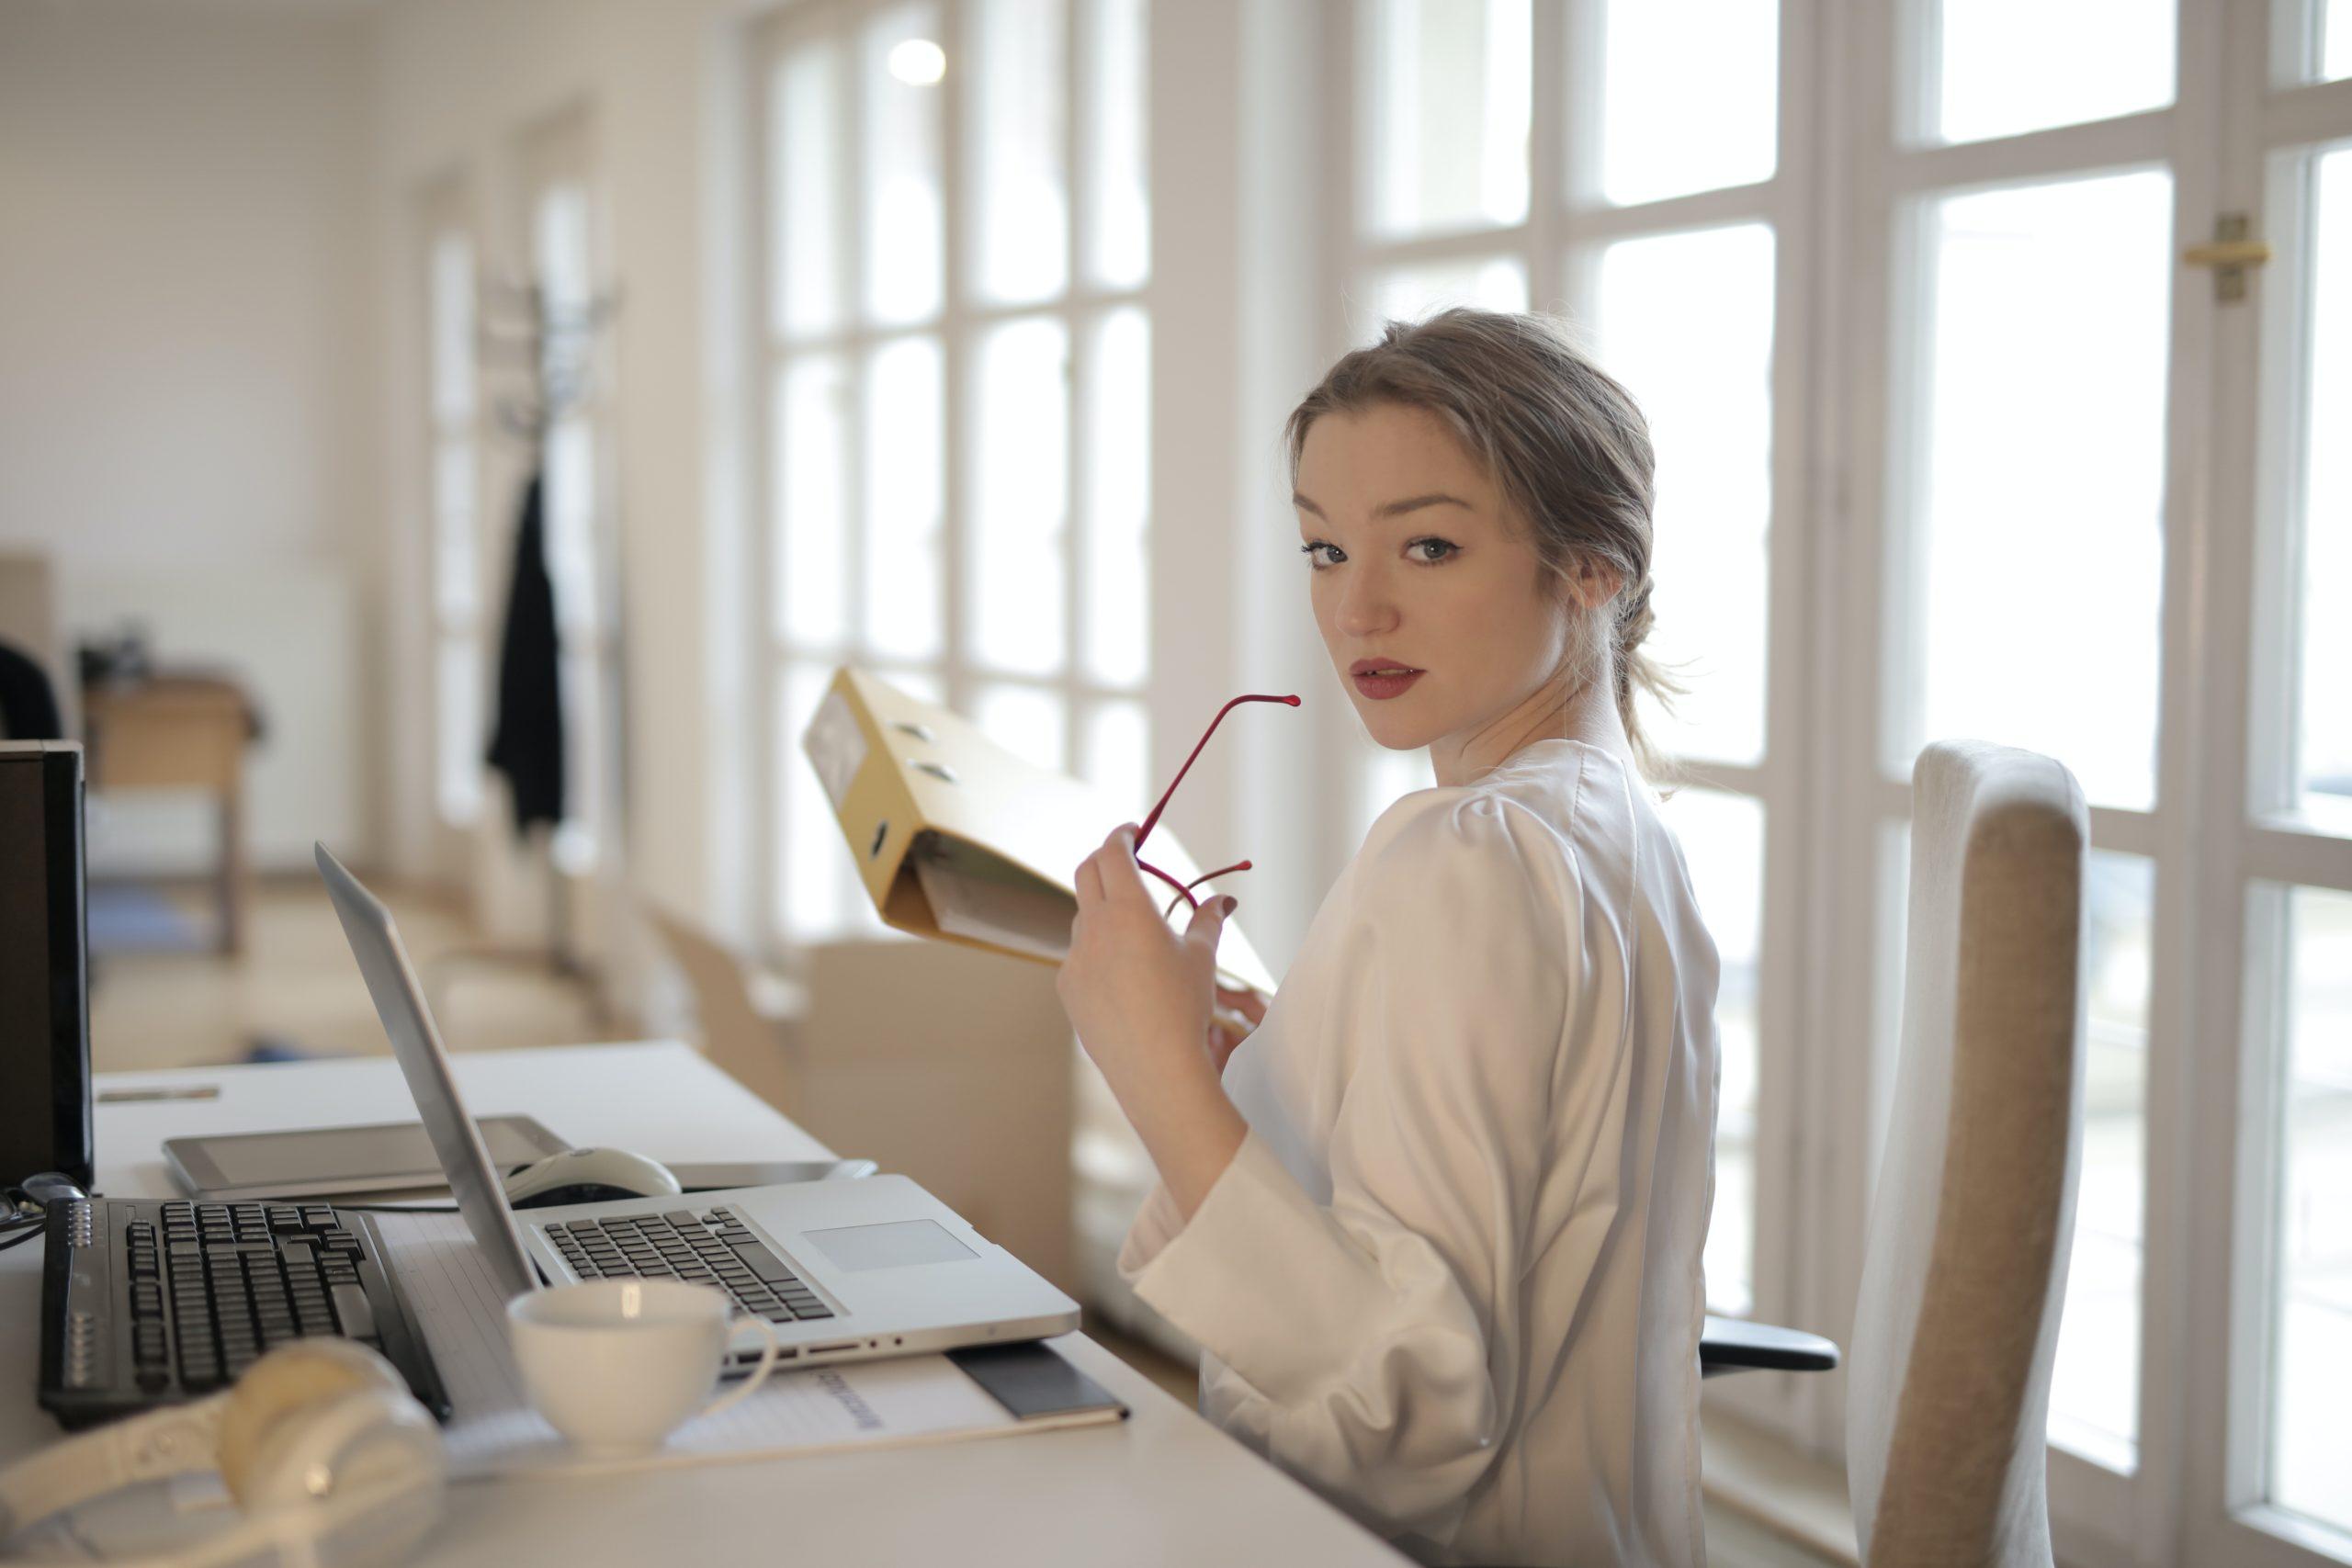 elegant-businesswoman-with-folder-in-office-3790833